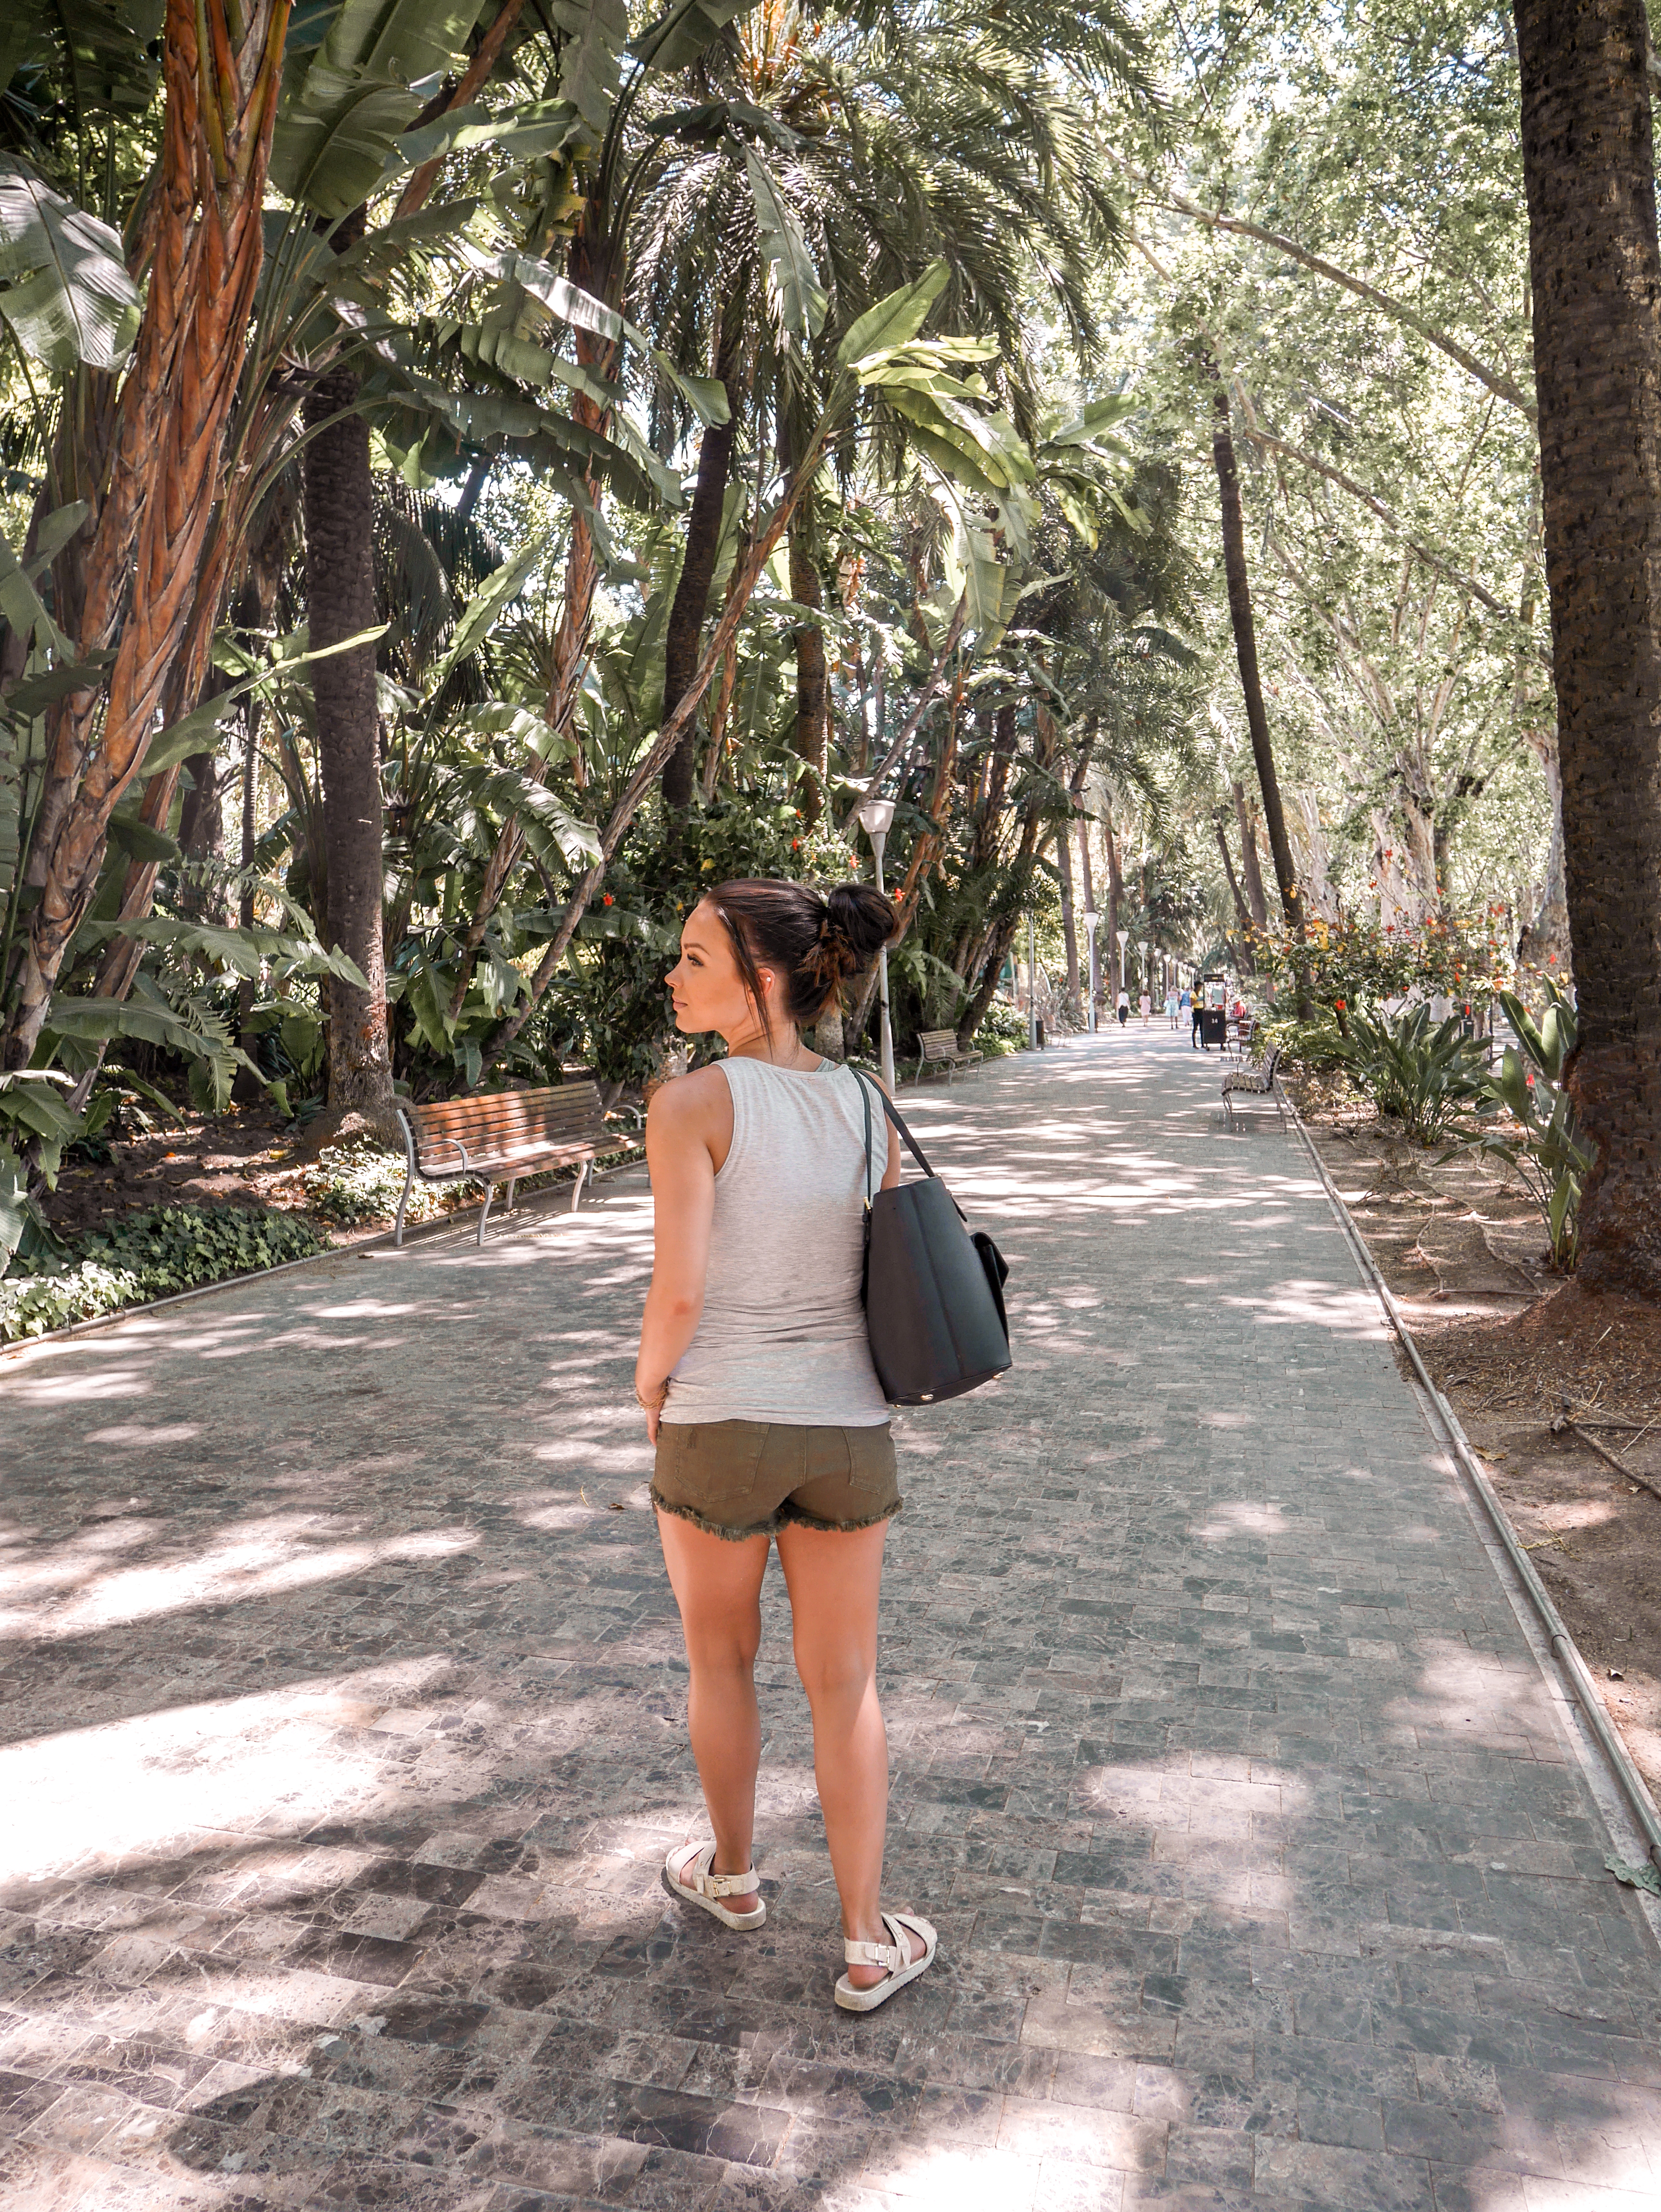 Malaga puistot